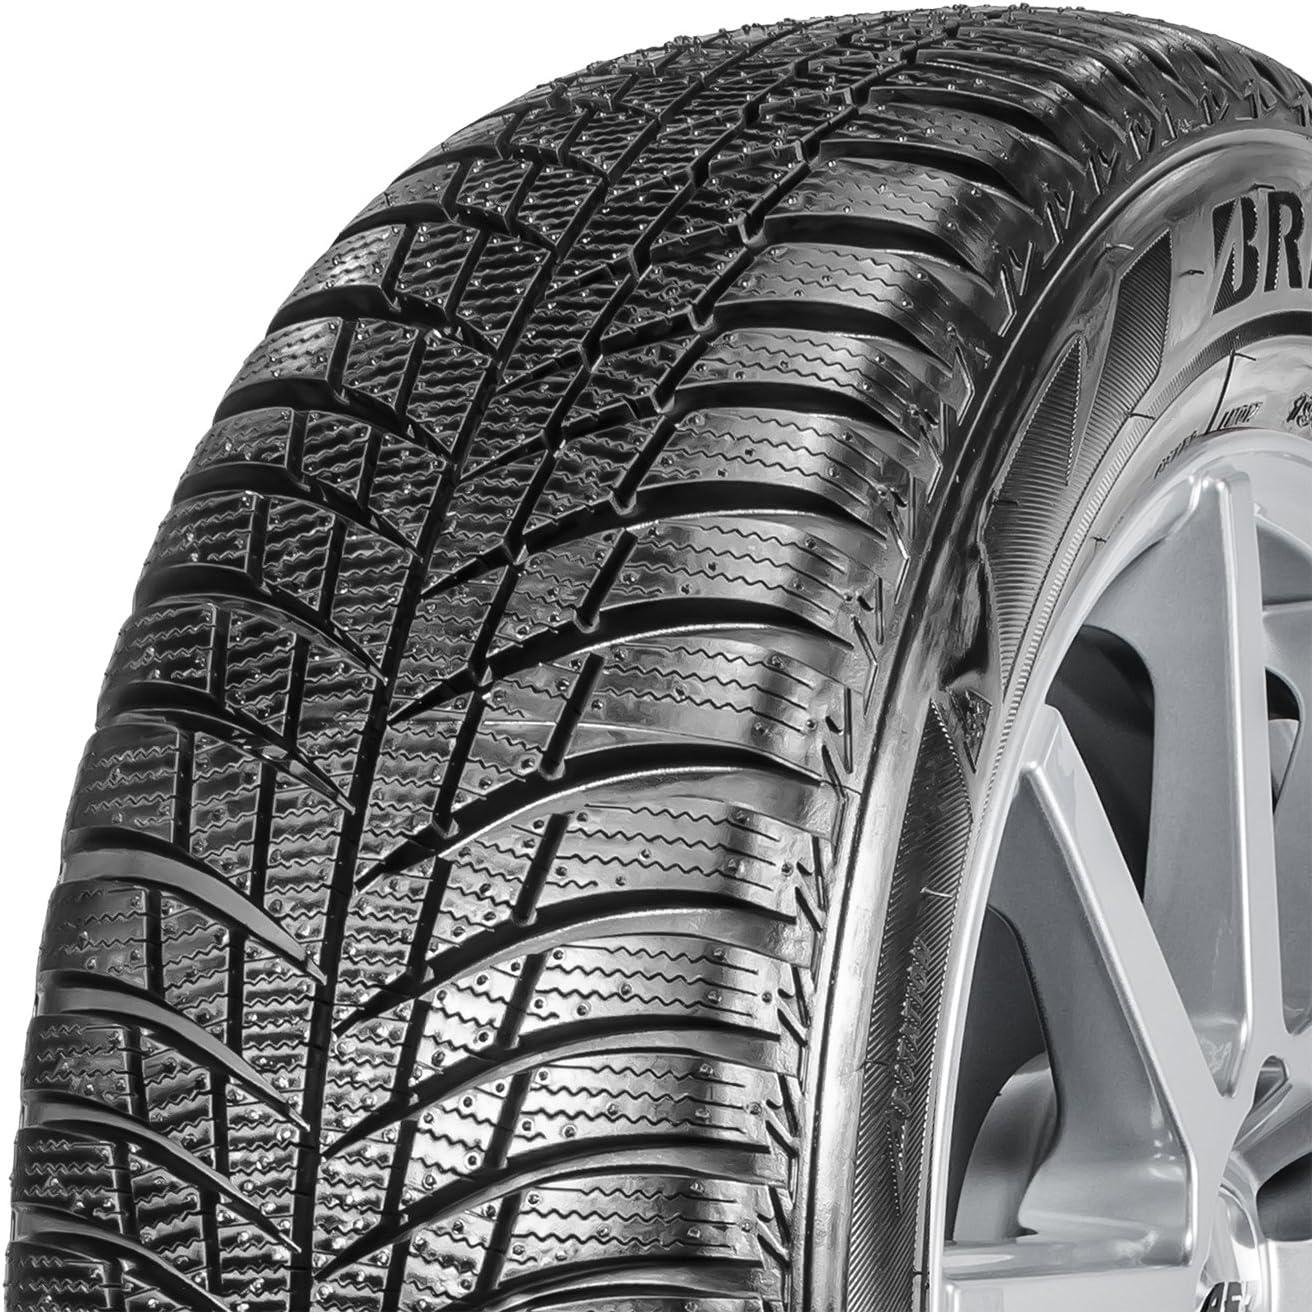 Bridgestone Blizzak Lm 001 M S 185 65r15 88t Winterreifen Auto